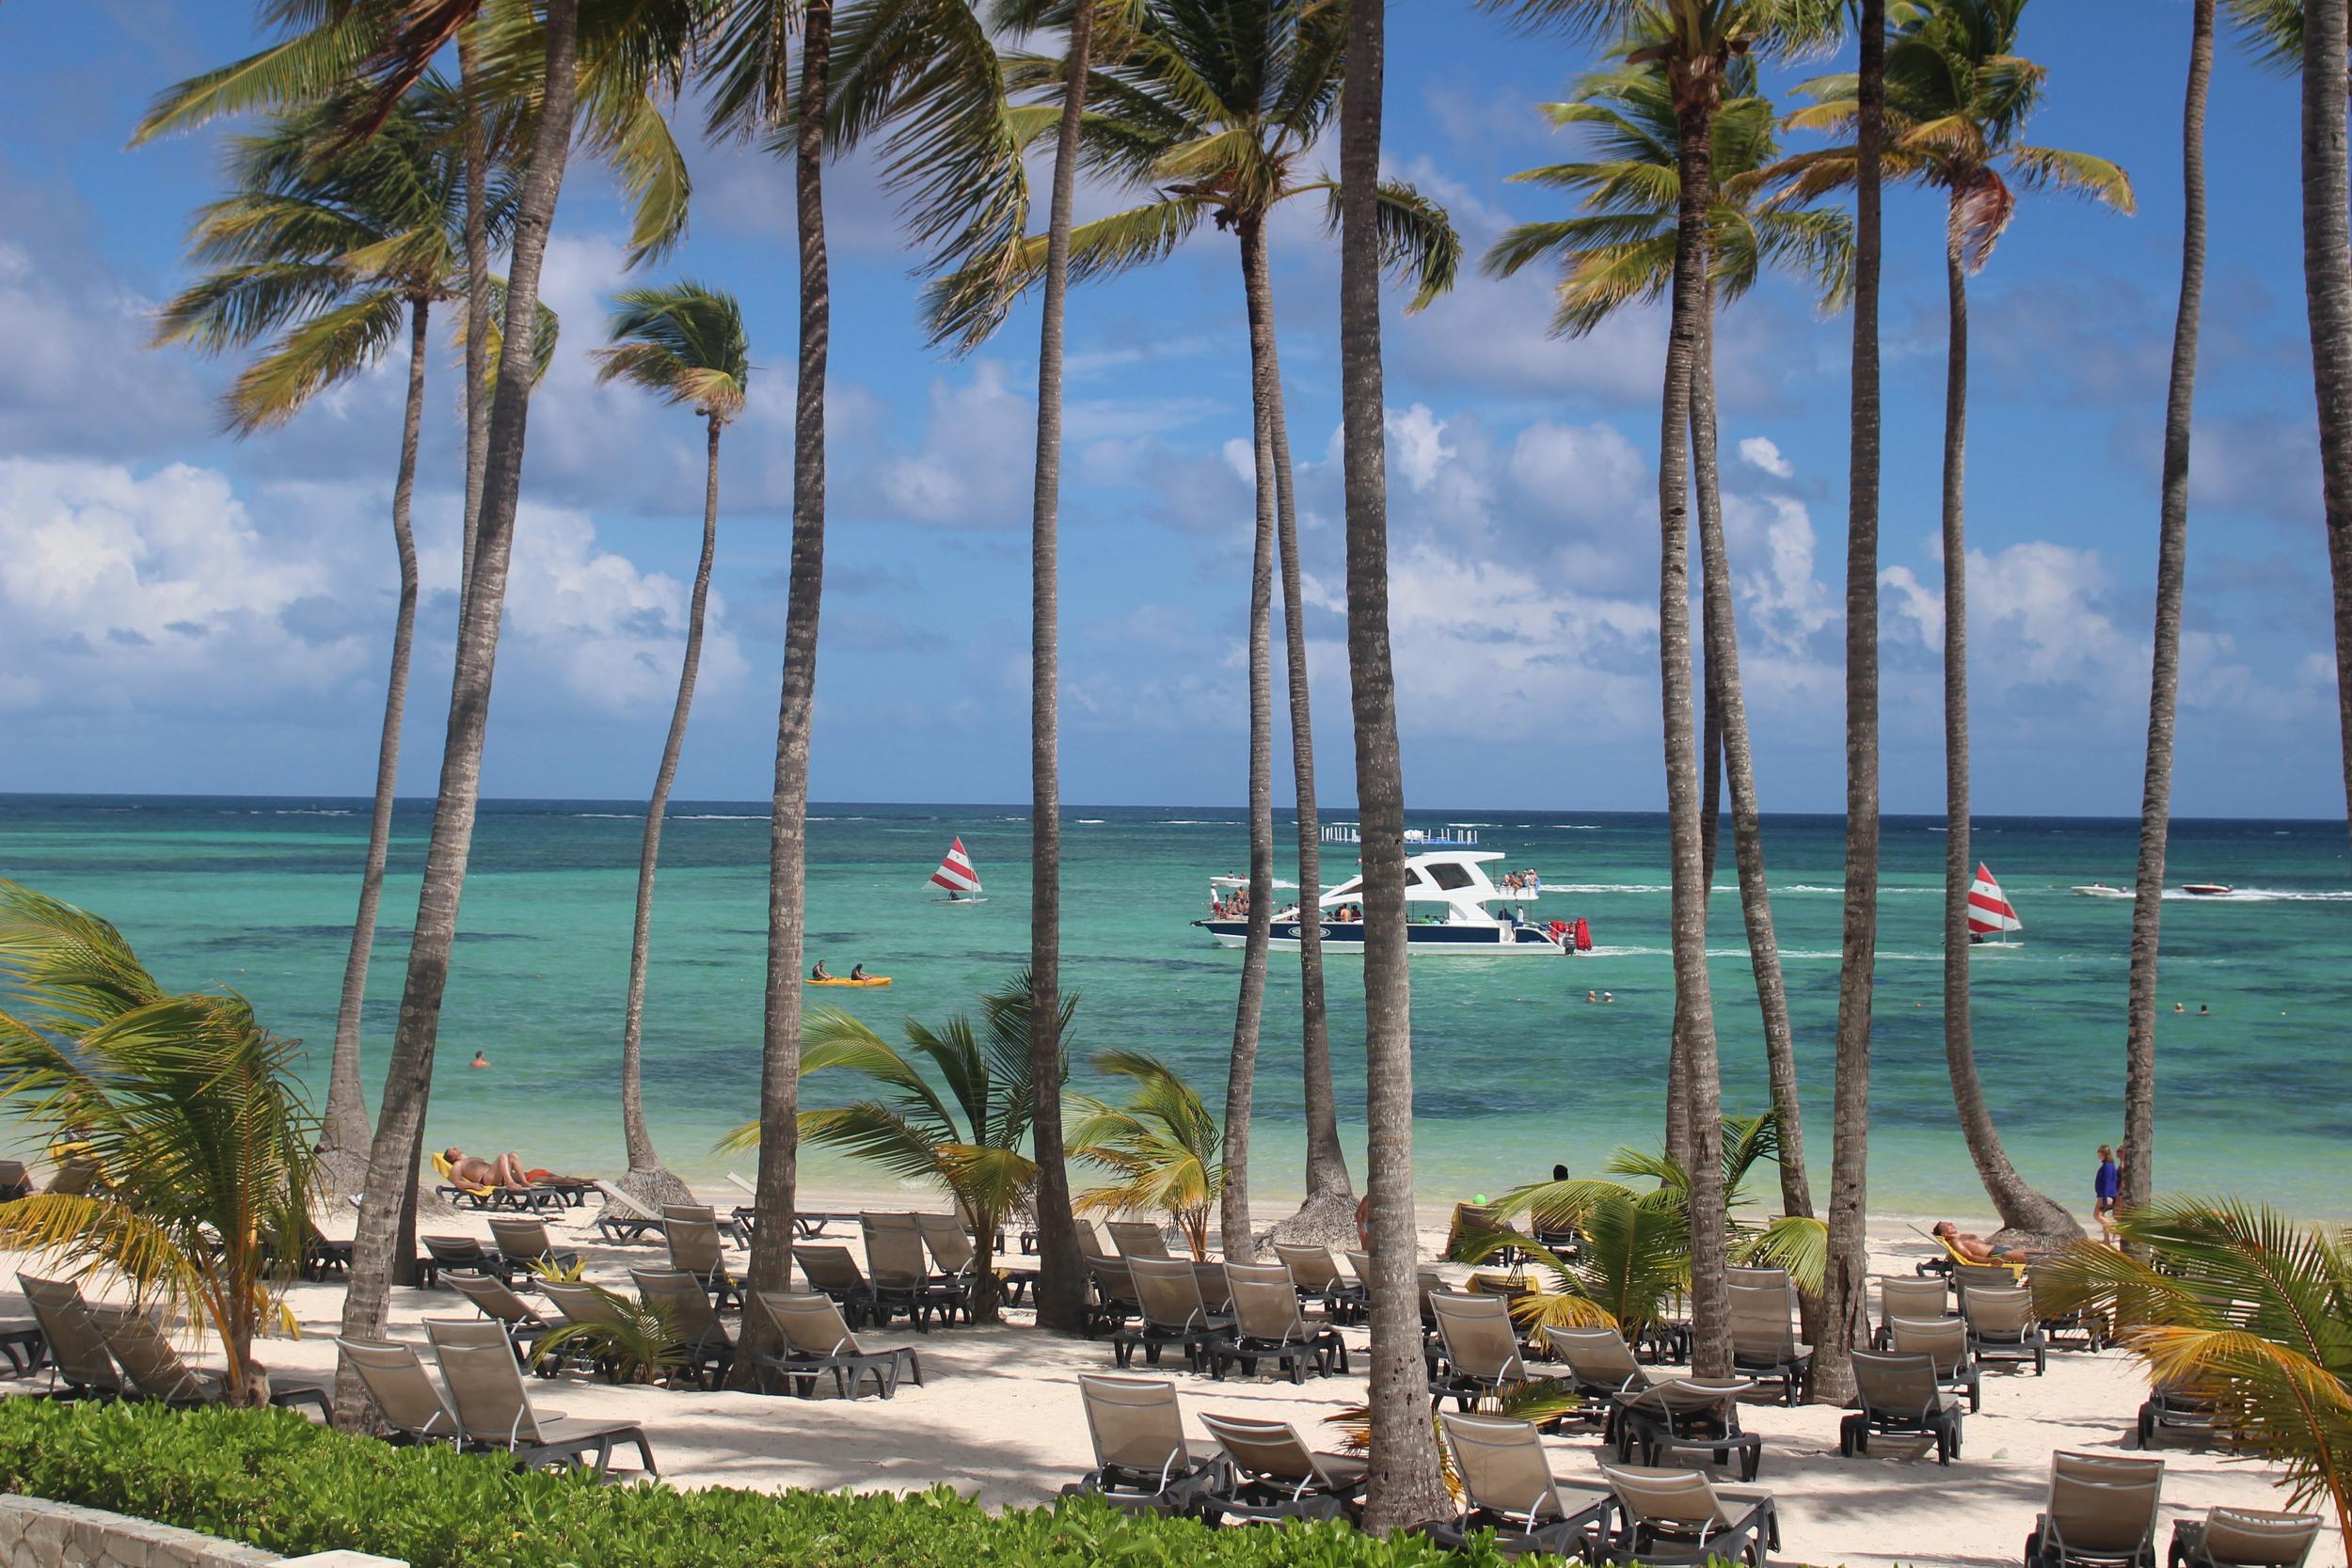 Barceló Bávaro Beach Resort, Dominican Republic. by Nneya Richards